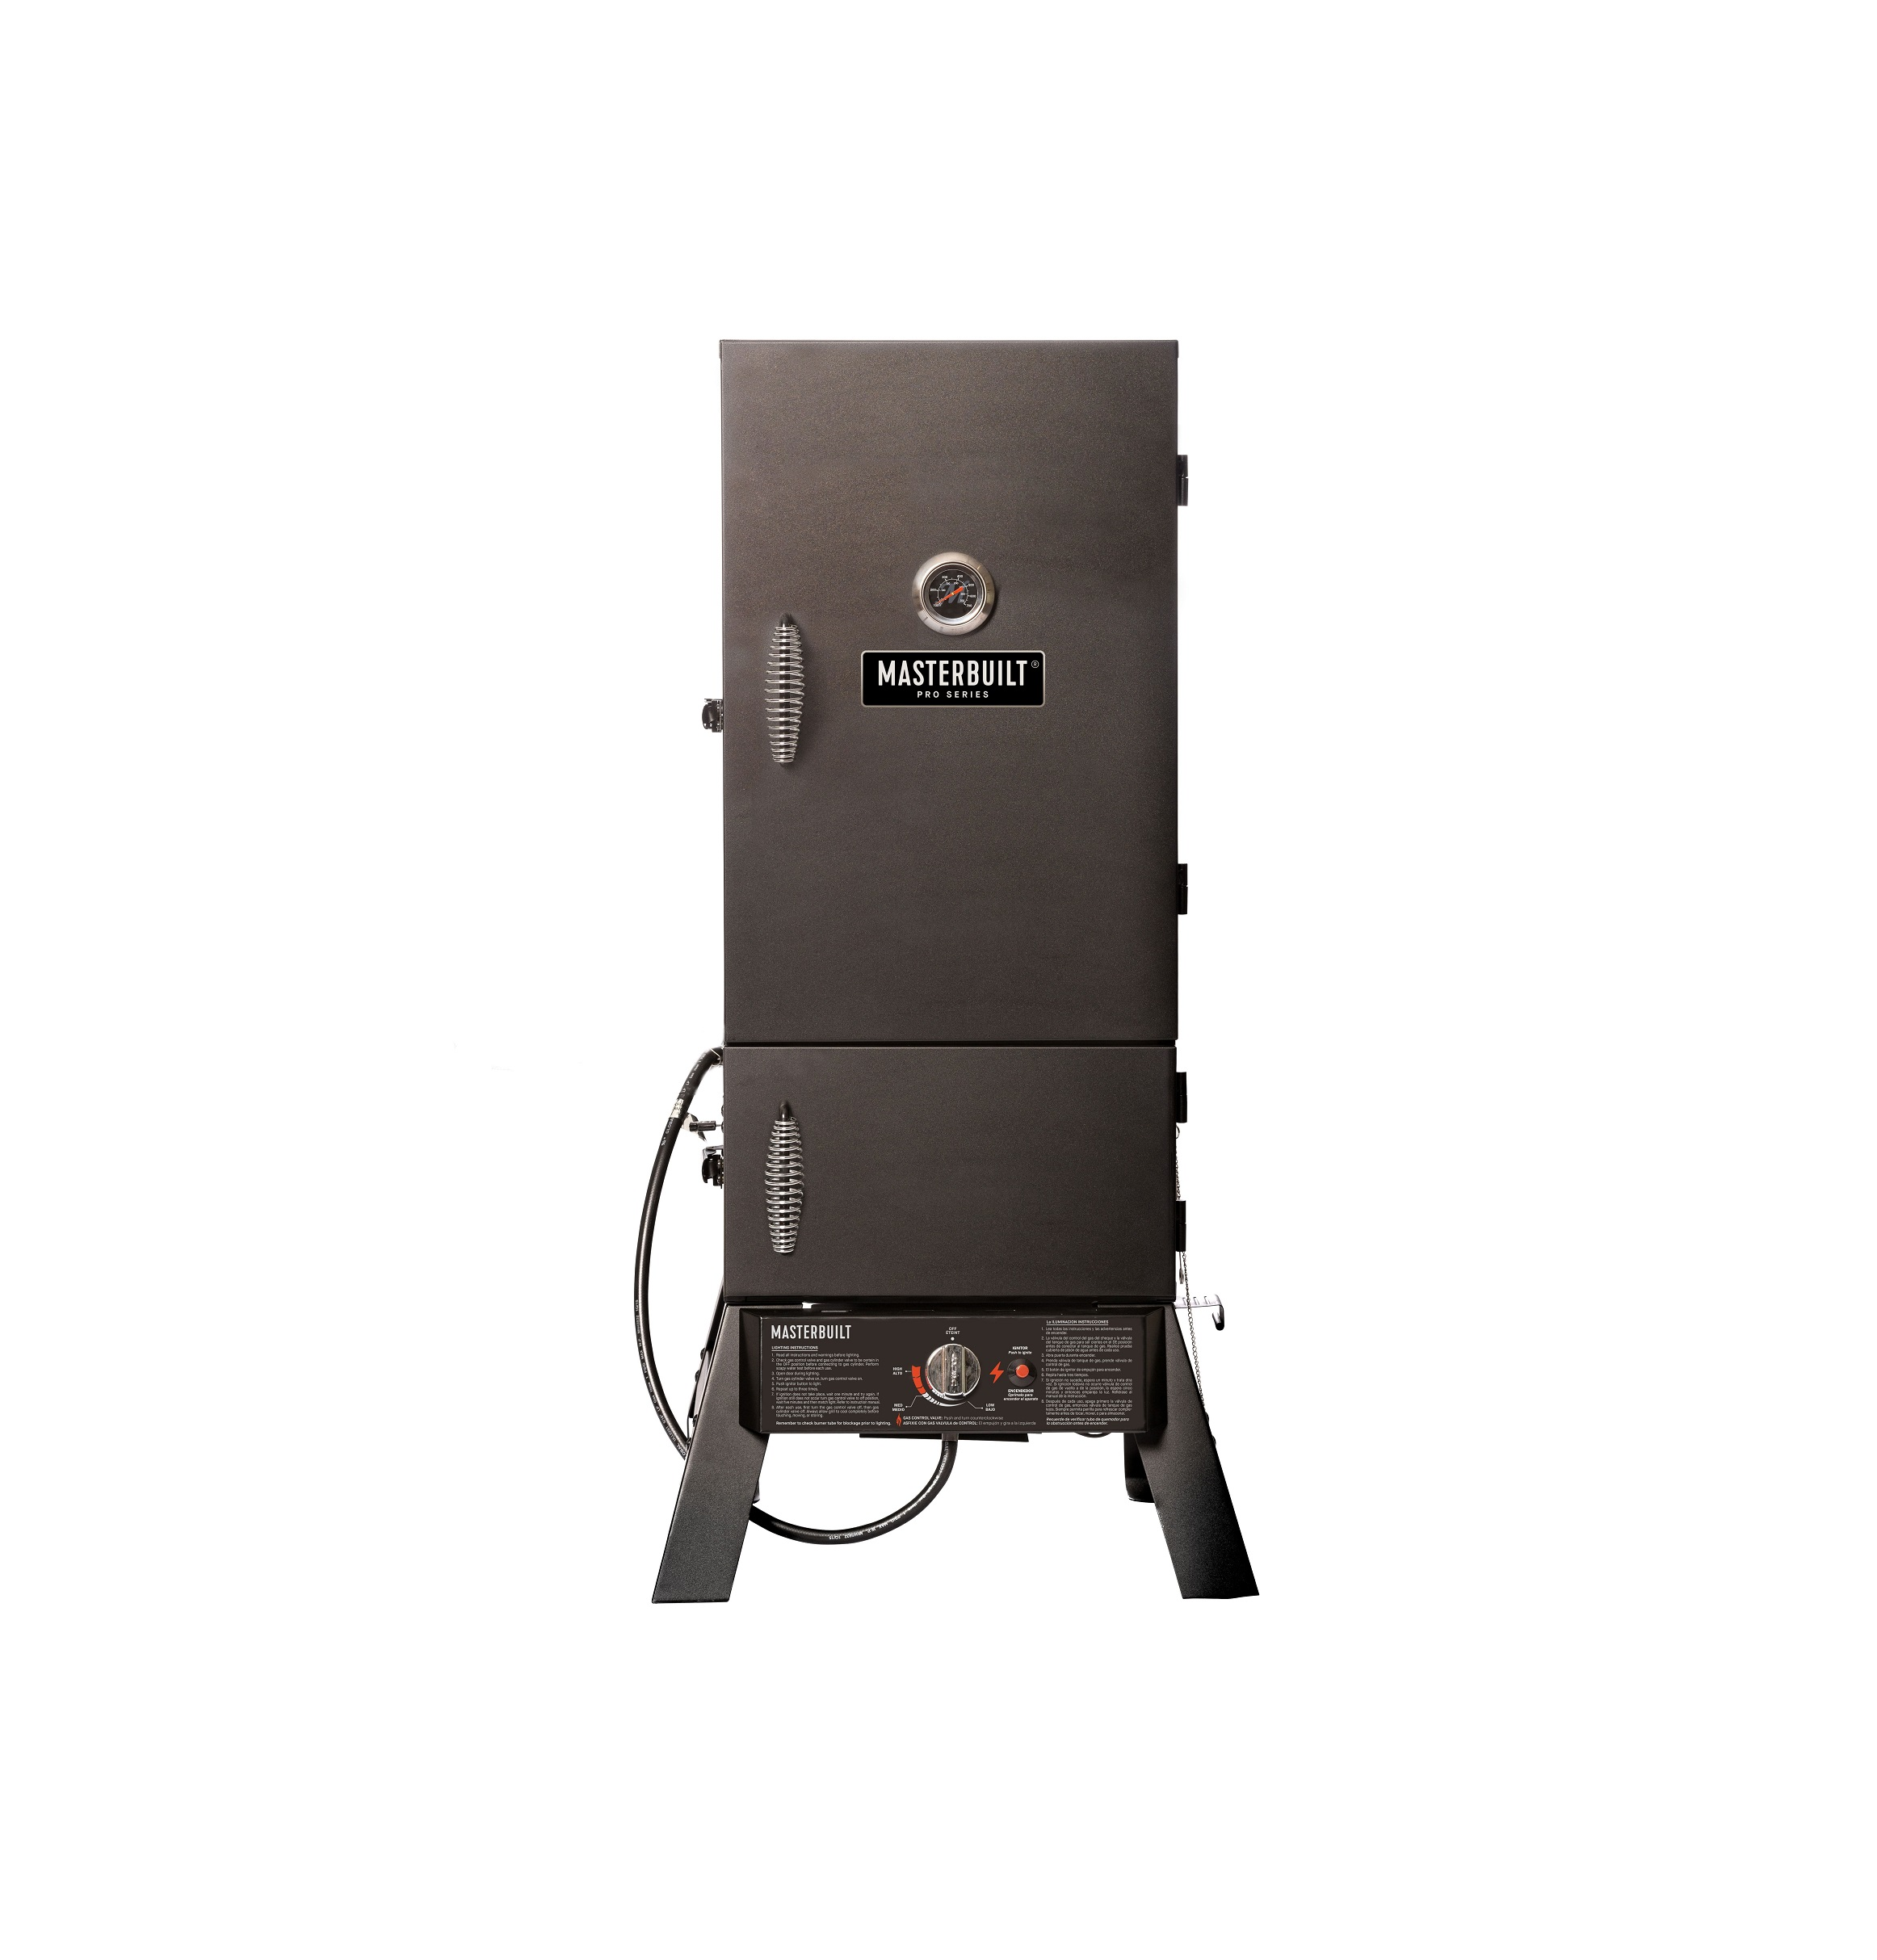 Masterbuilt Pro Series Dual Fuel Smoker